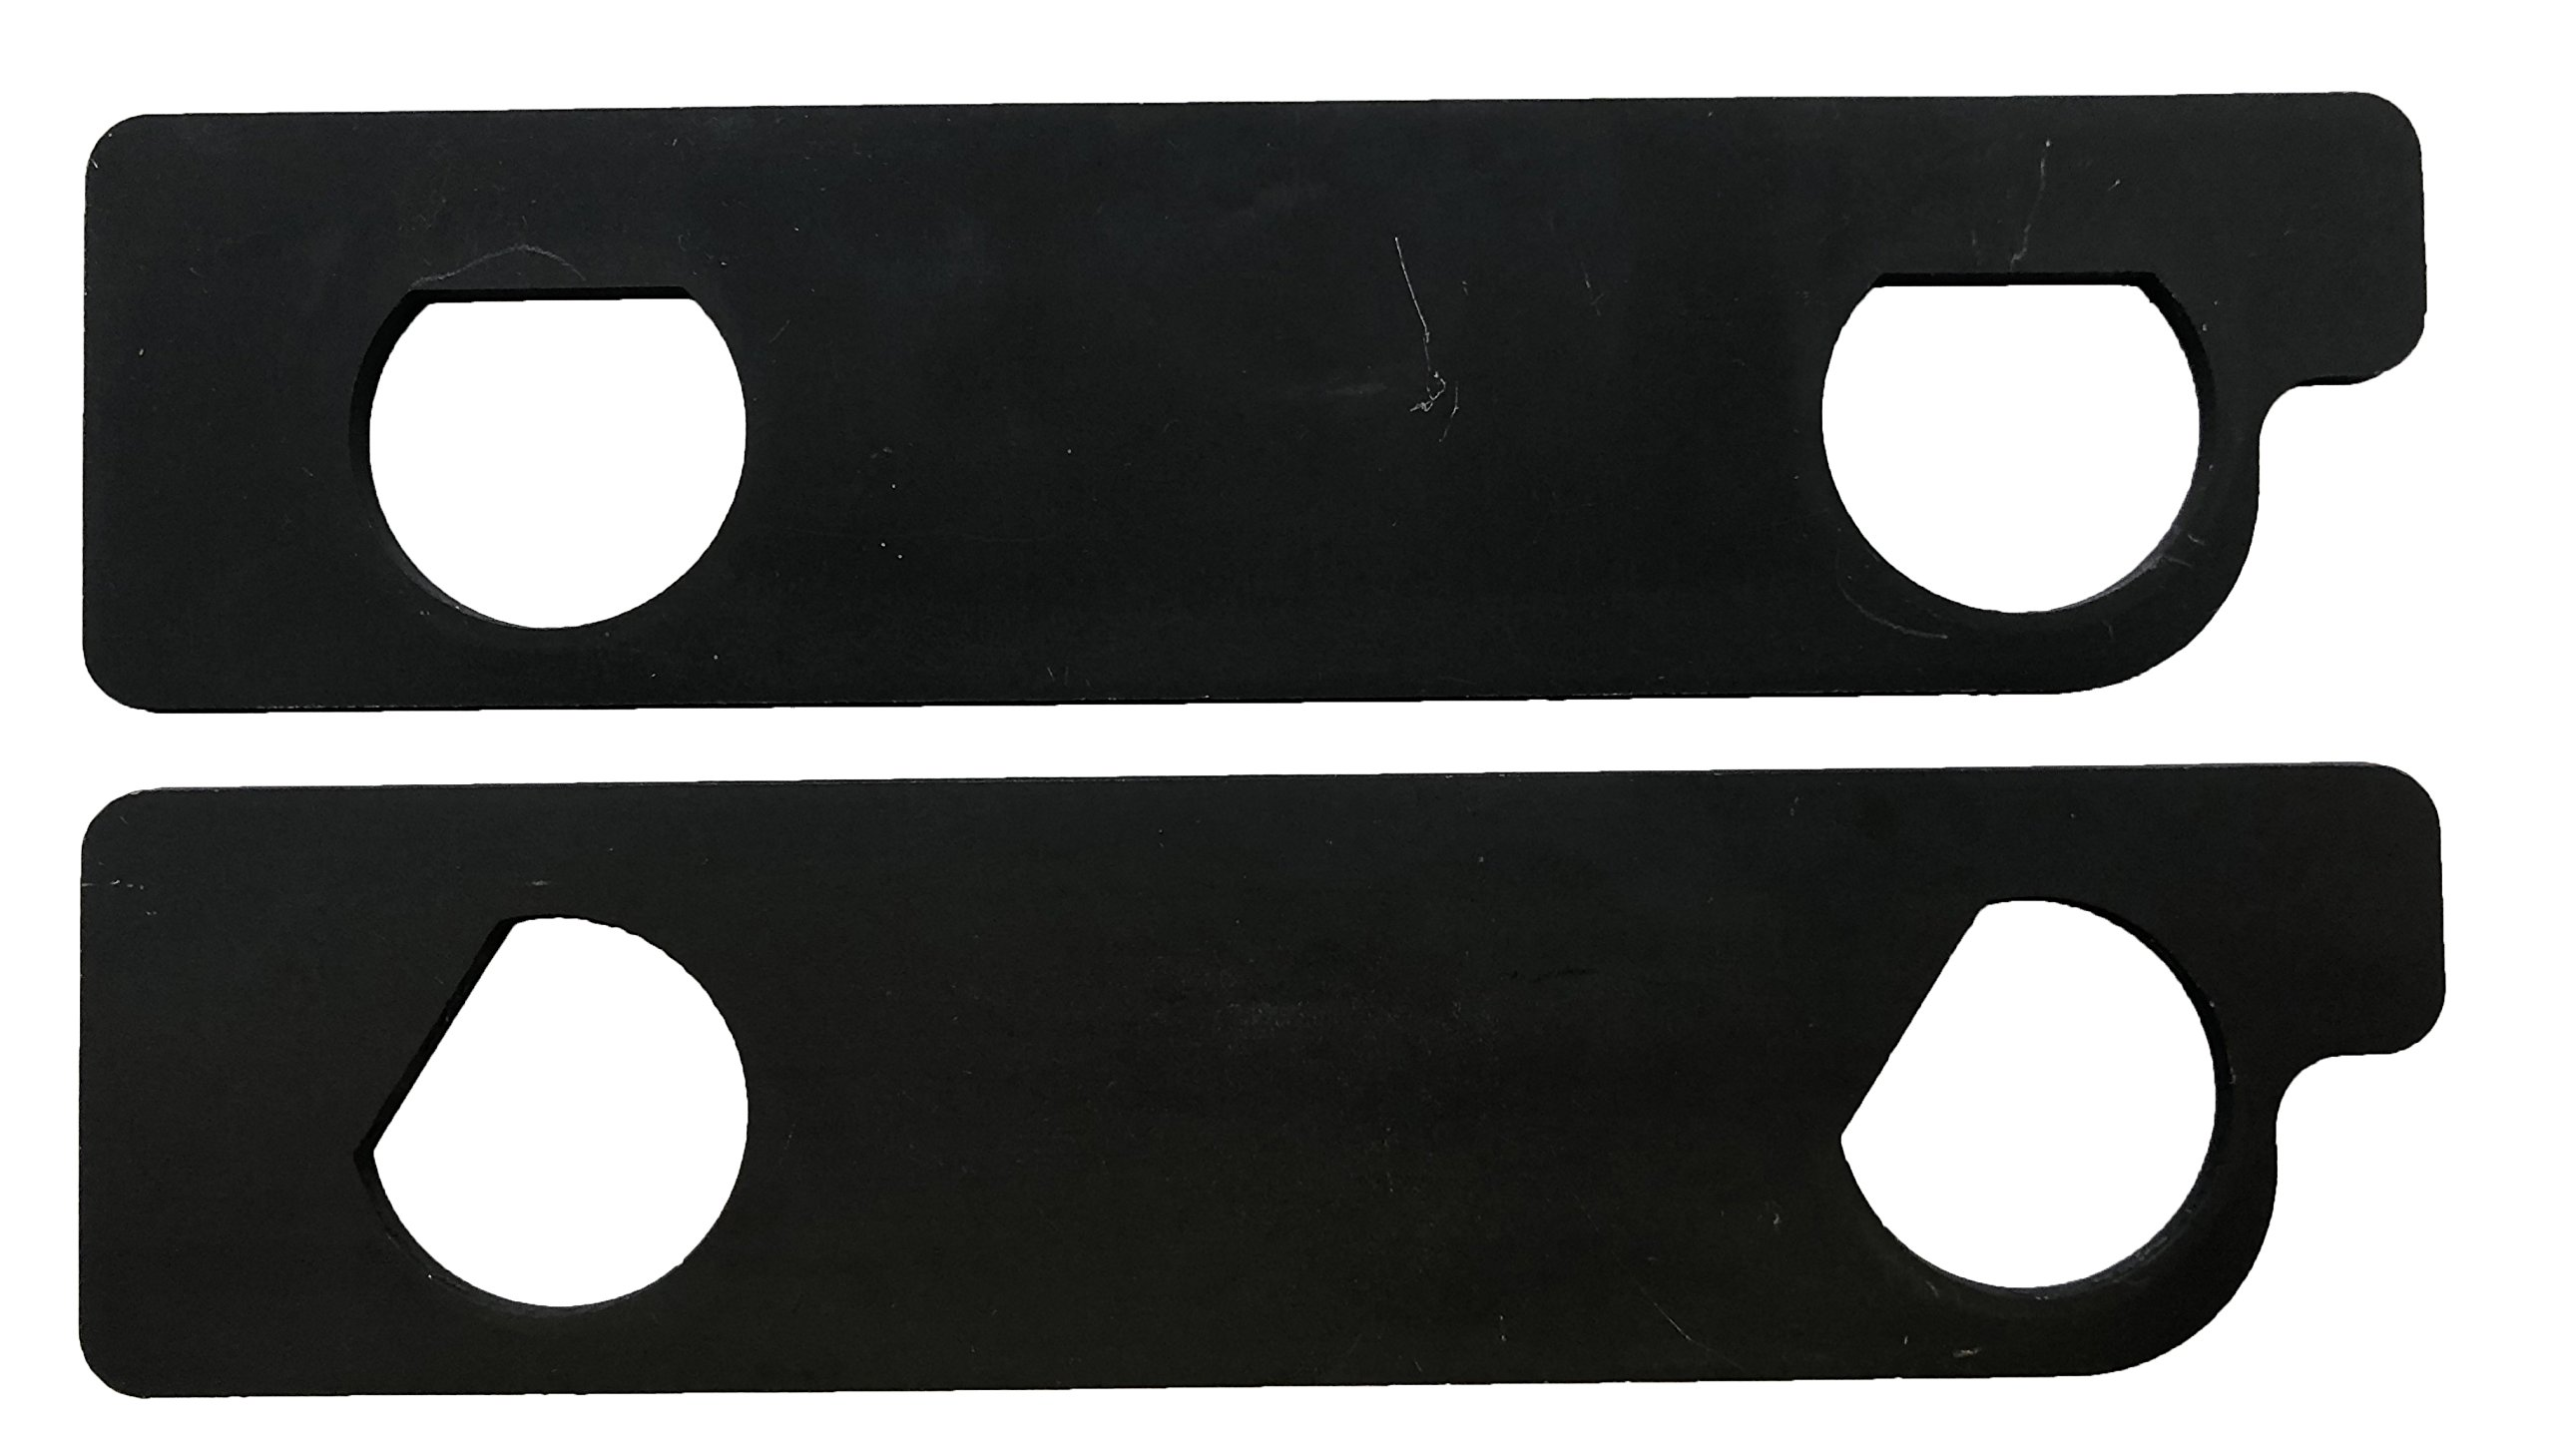 CTA Tools 1802 GM 3.6L Camshaft Holding Tool